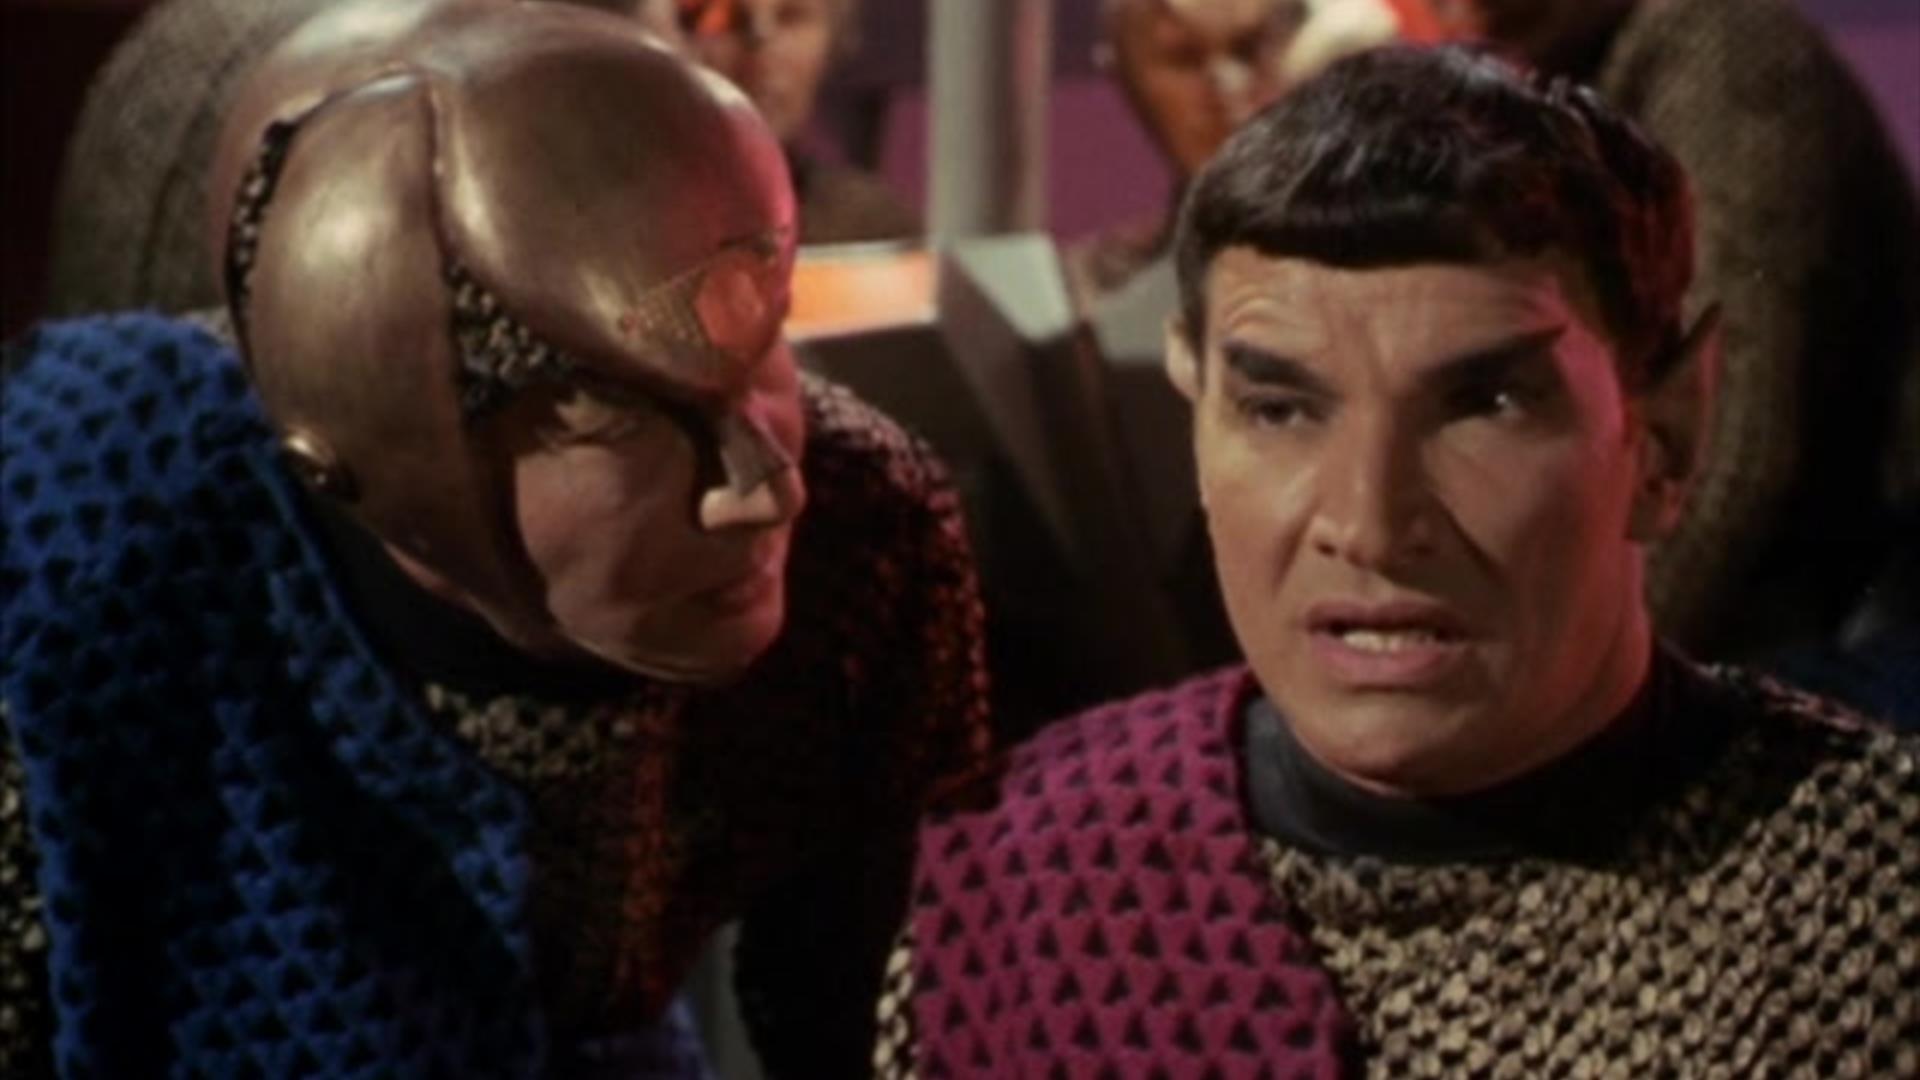 Watch Star Trek: The Original Series (Remastered) Season 1 Episode 14:  Balance of Terror - Full show on CBS All Access